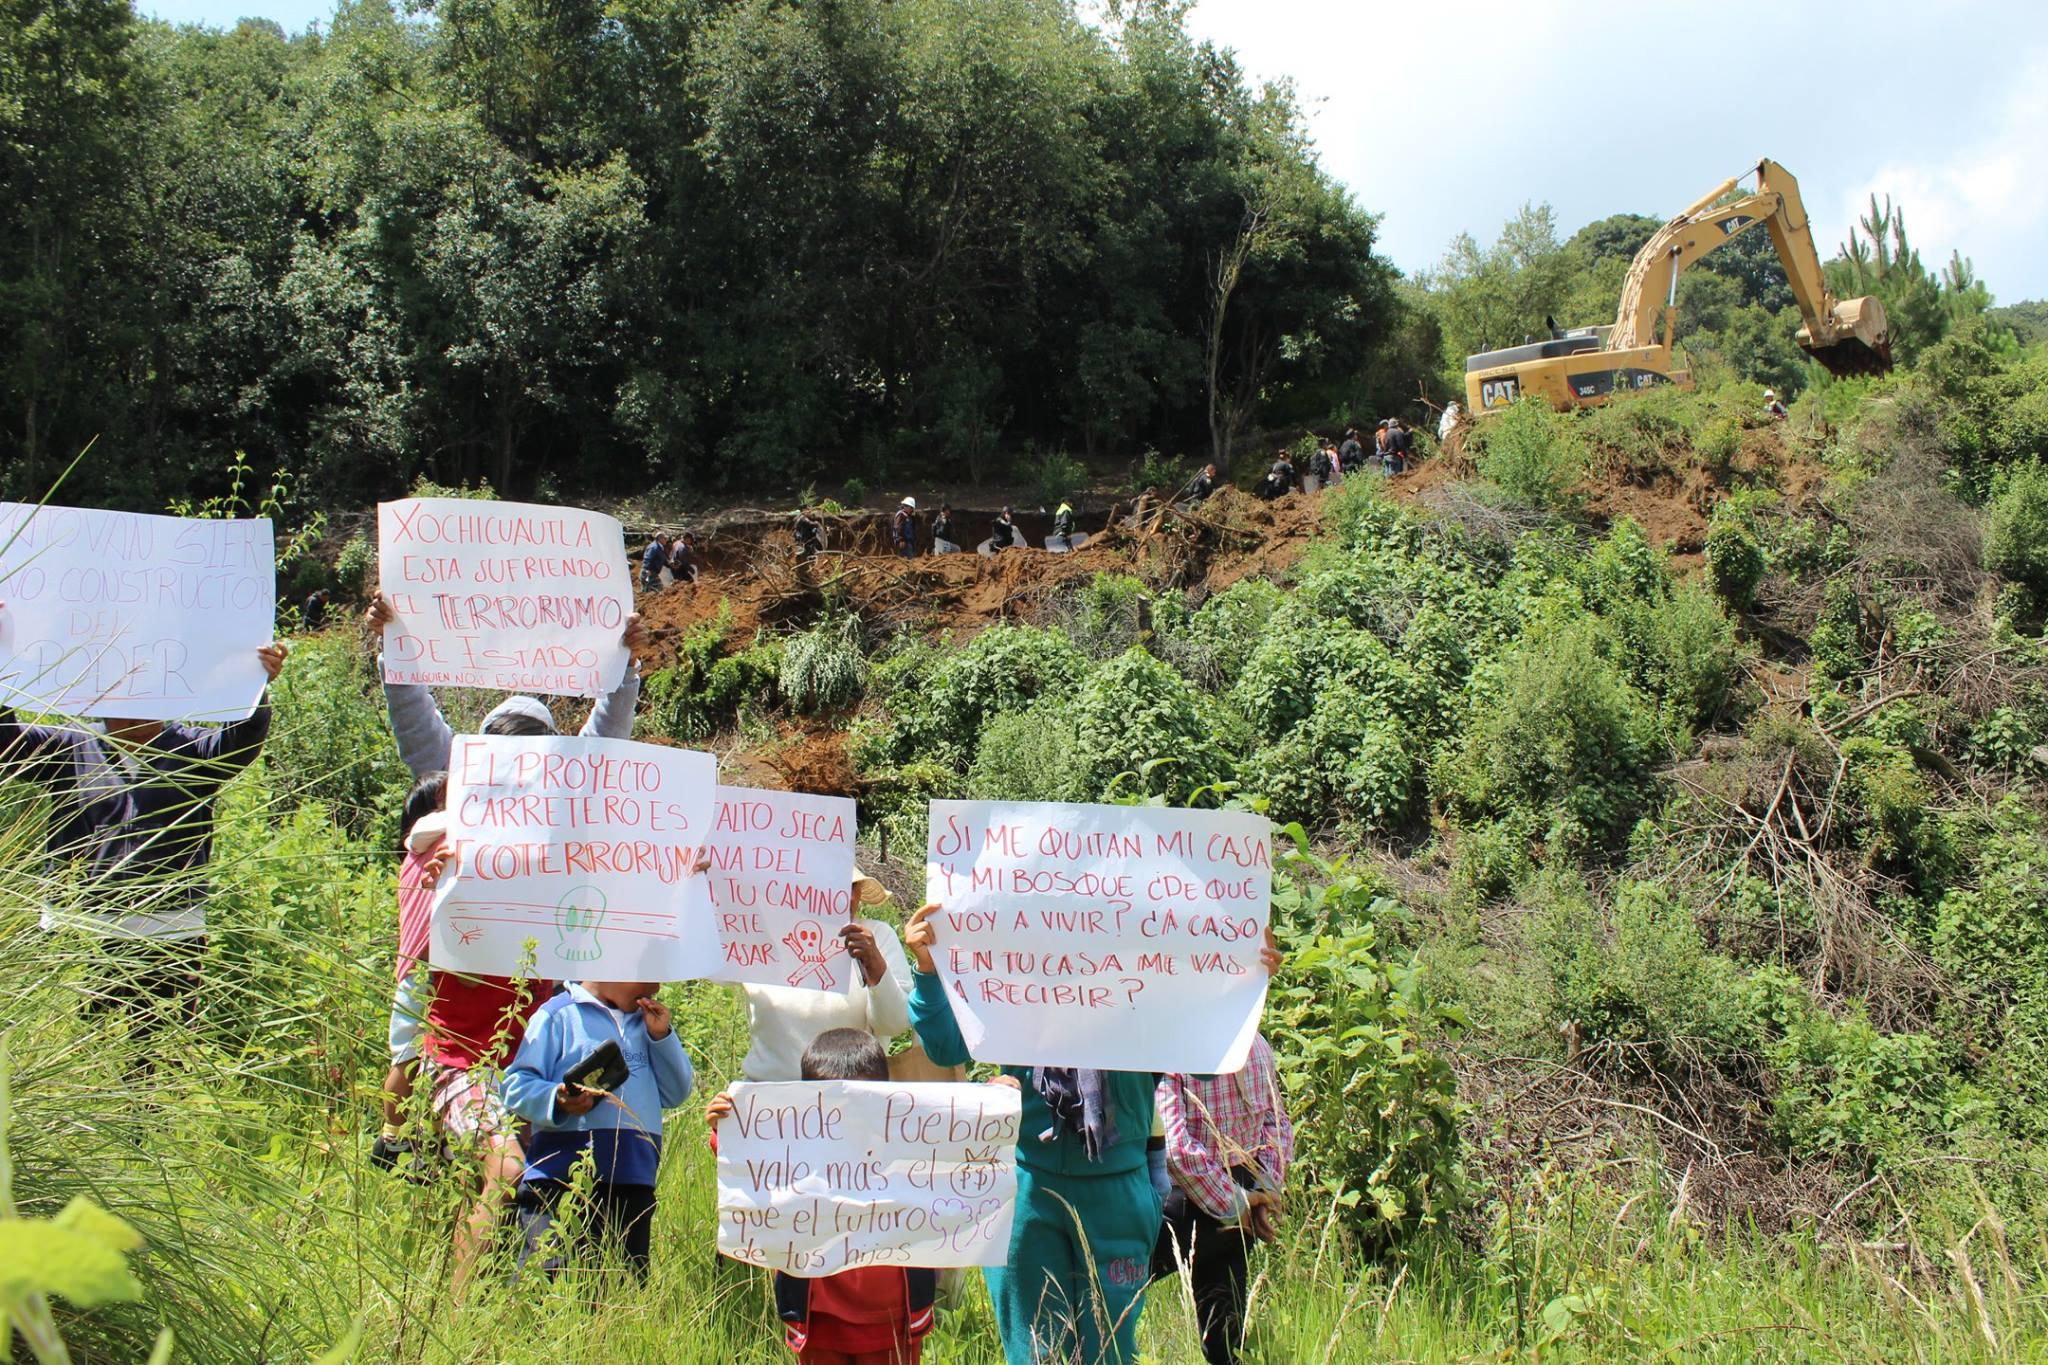 Indígenas Otomíes rechazan proyecto carretero Toluca- Naucalpan